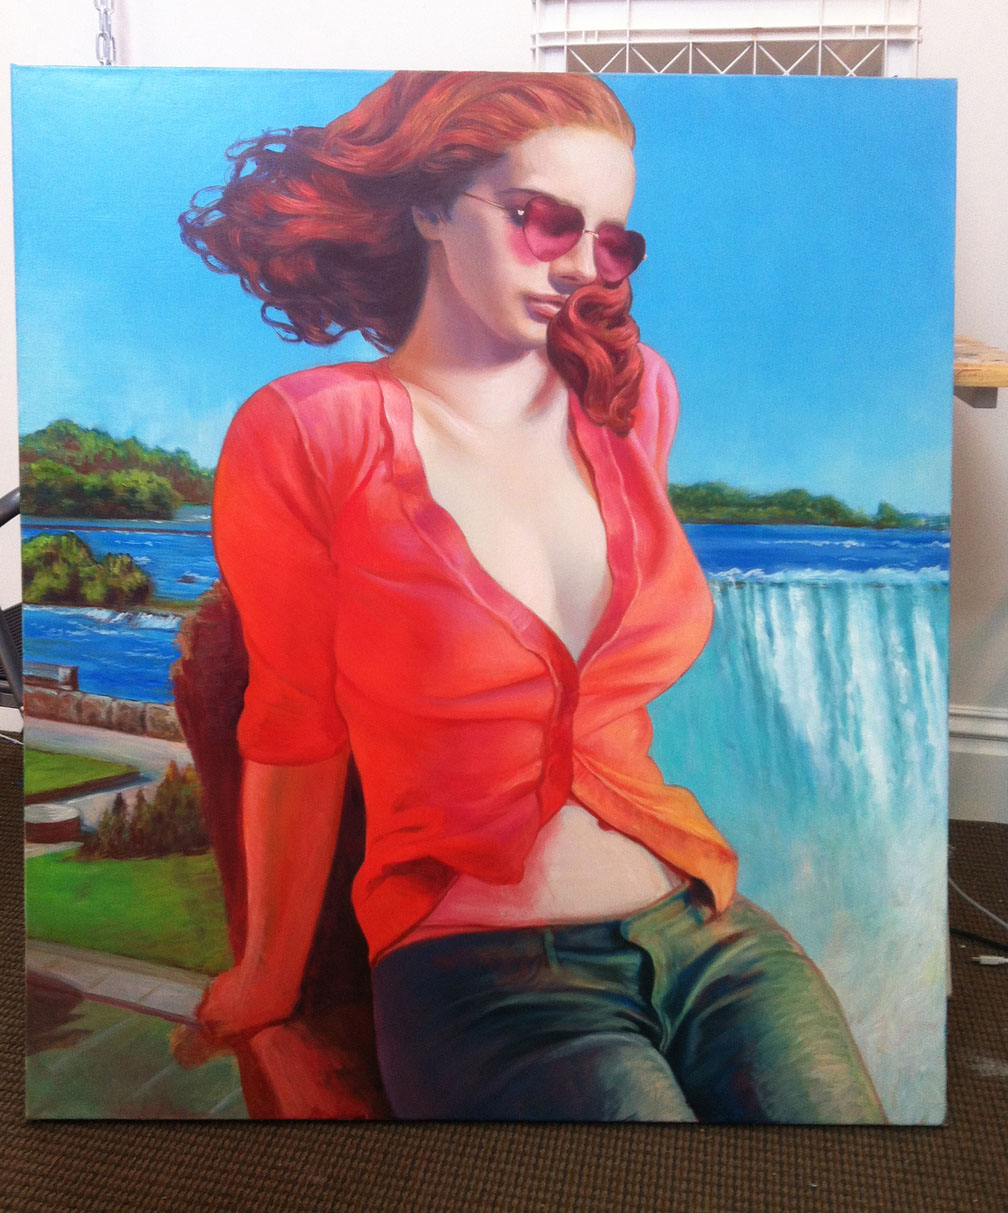 NiagaraRedSweater (inprogress) 040914.jpg